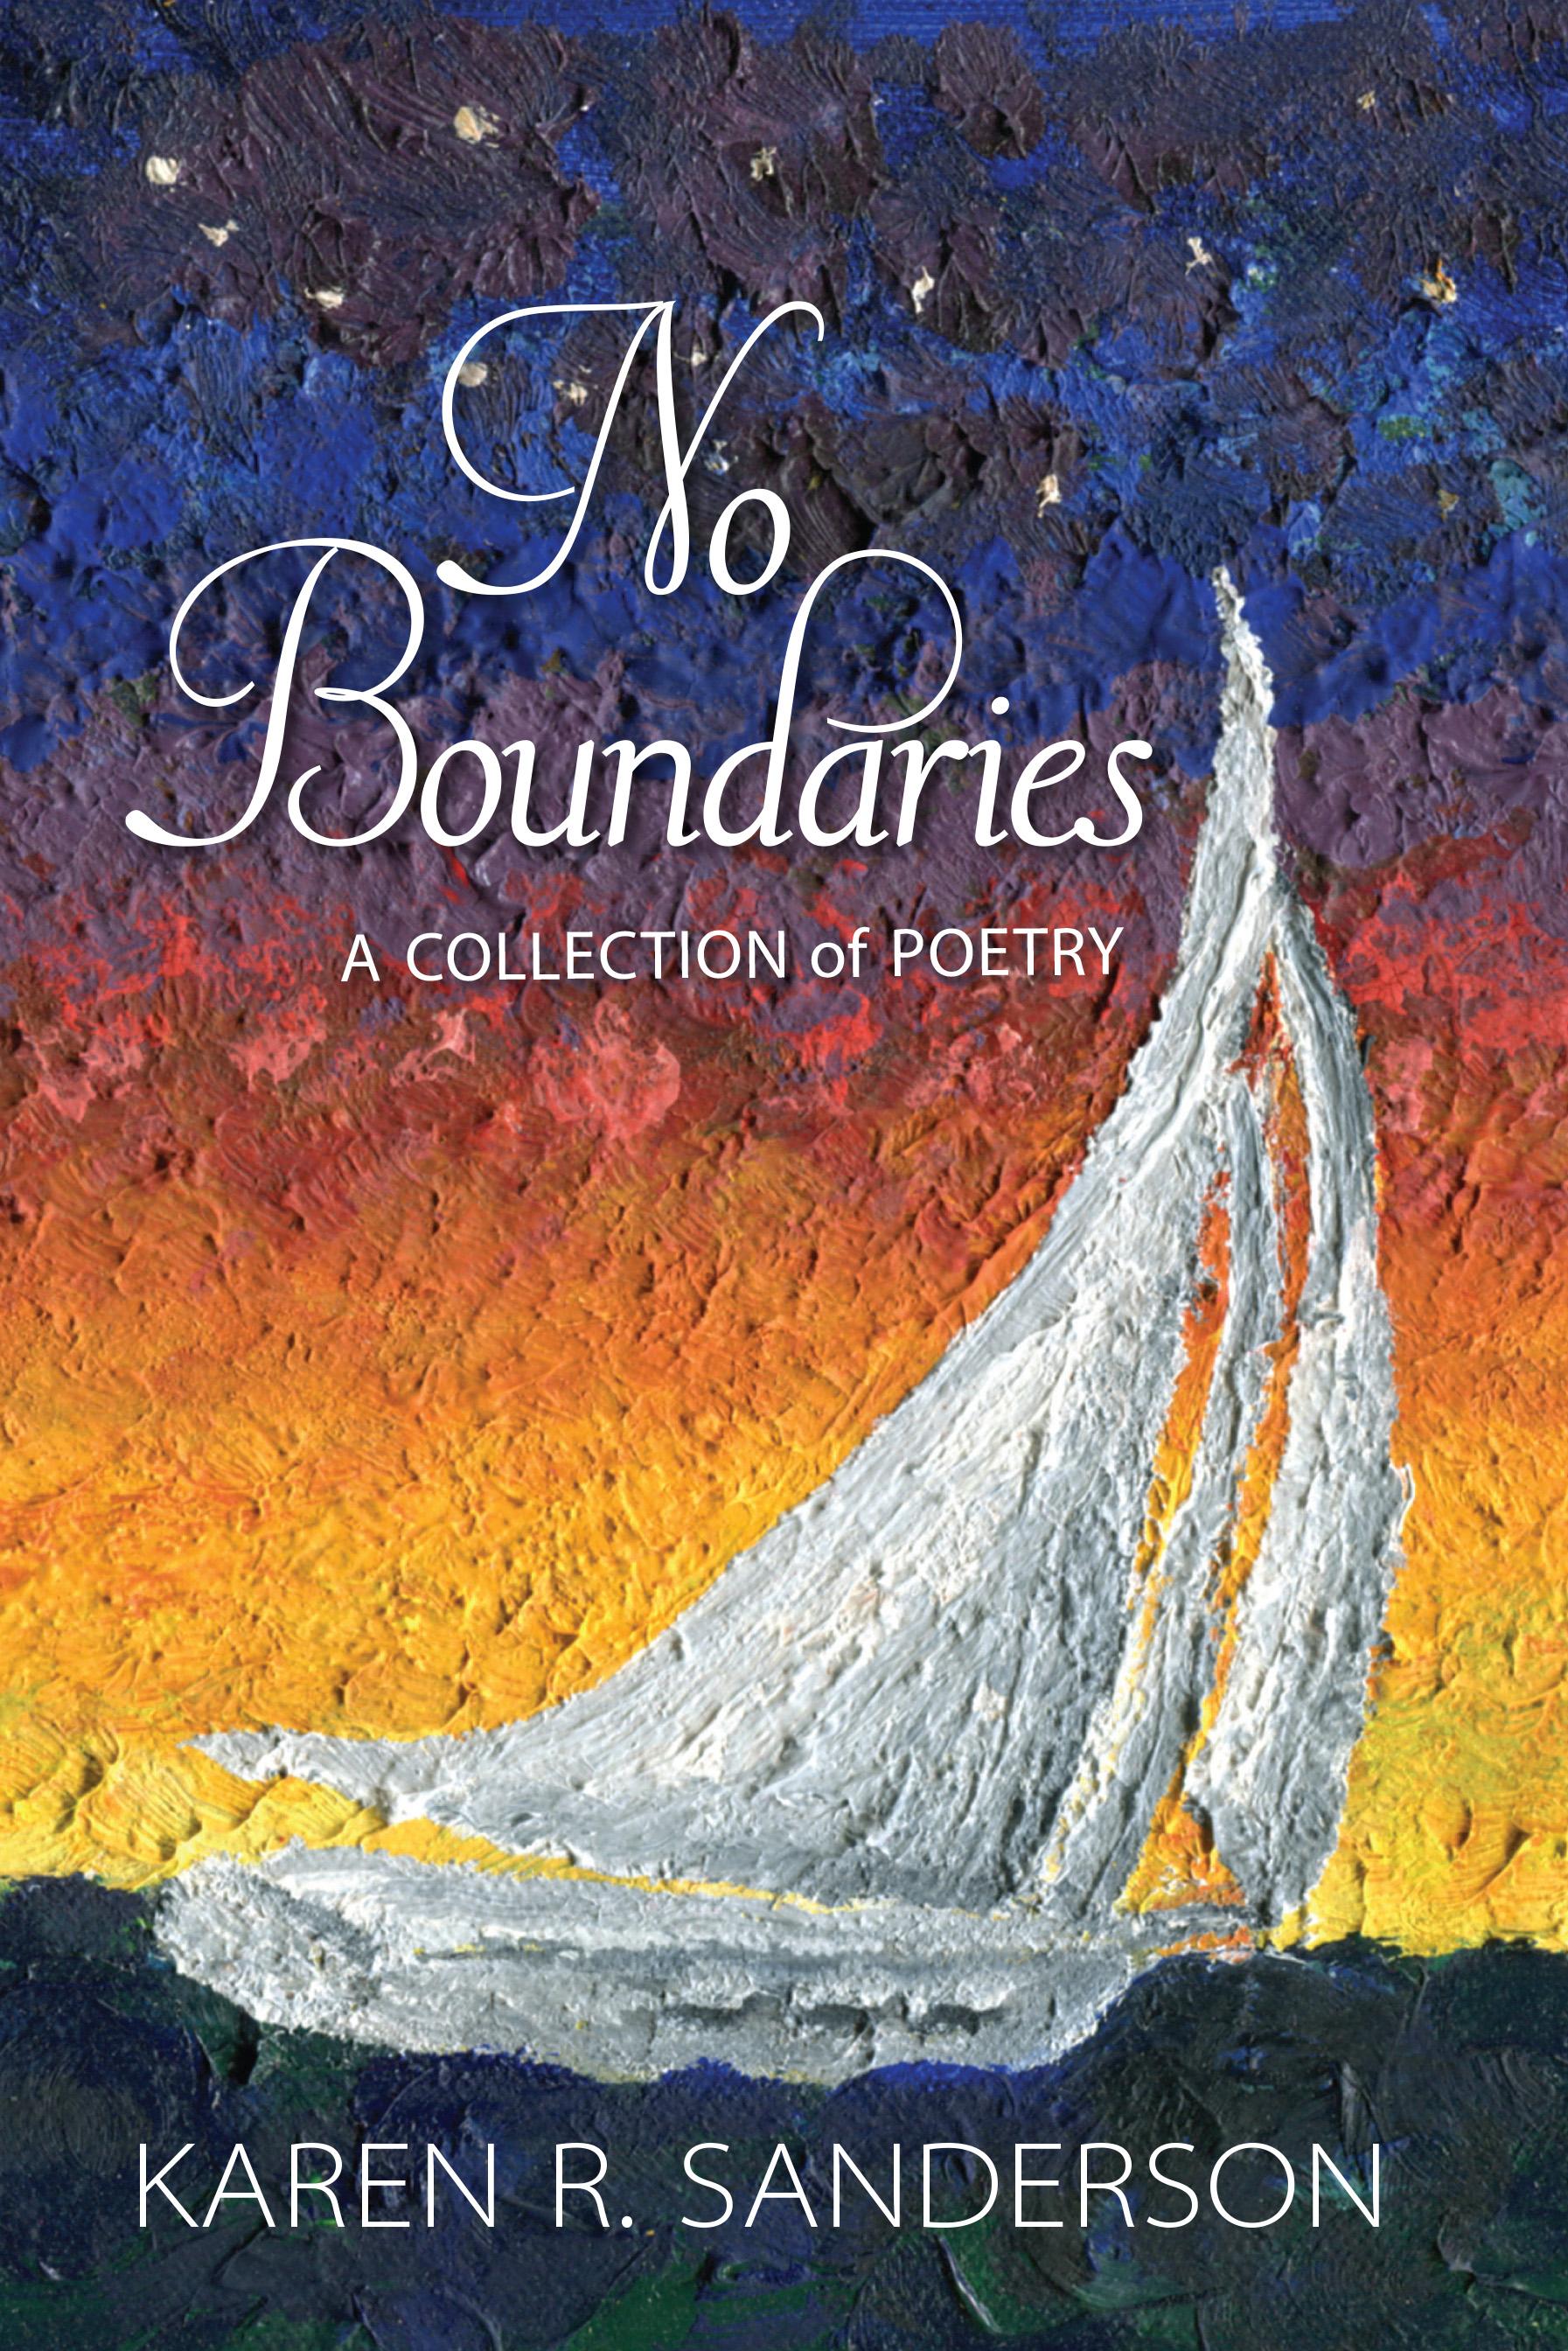 noboundariescover-frontonly